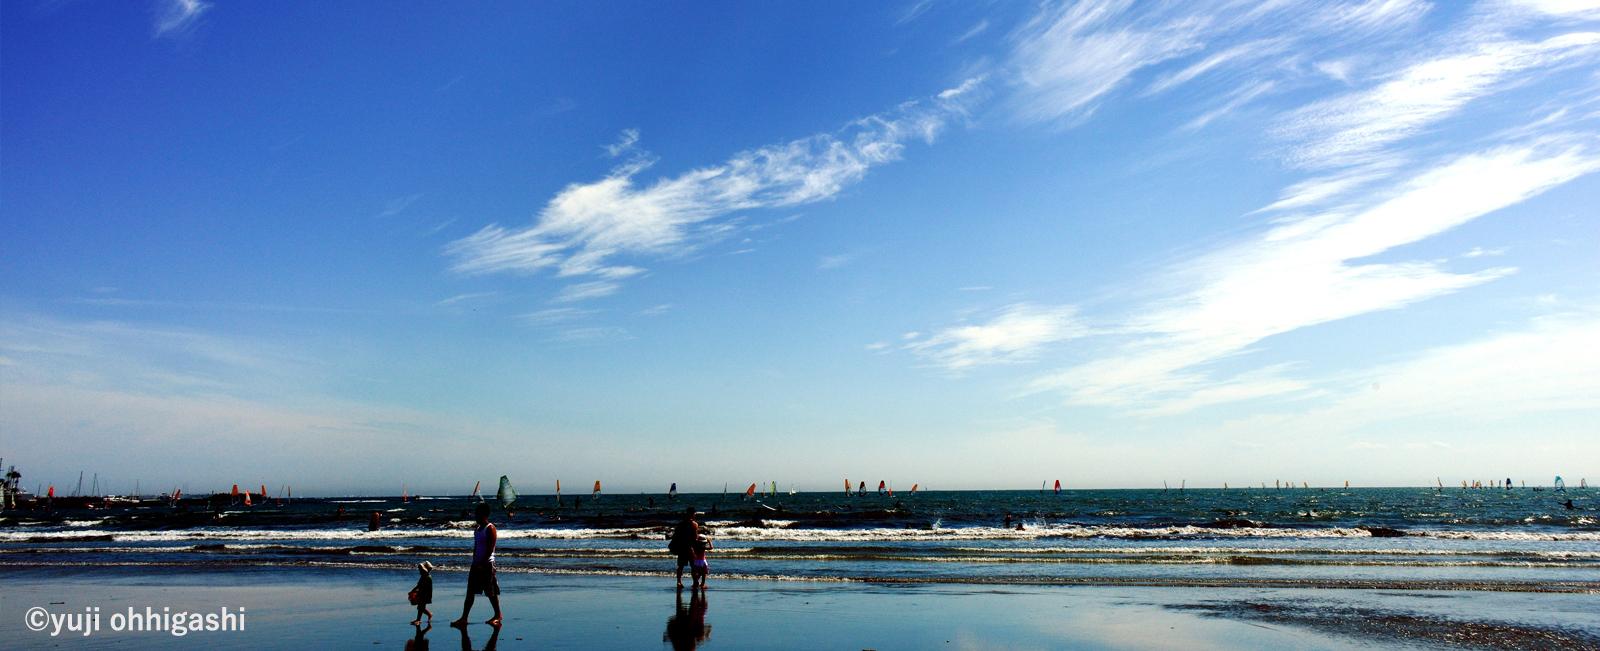 Zaimokuza Beach